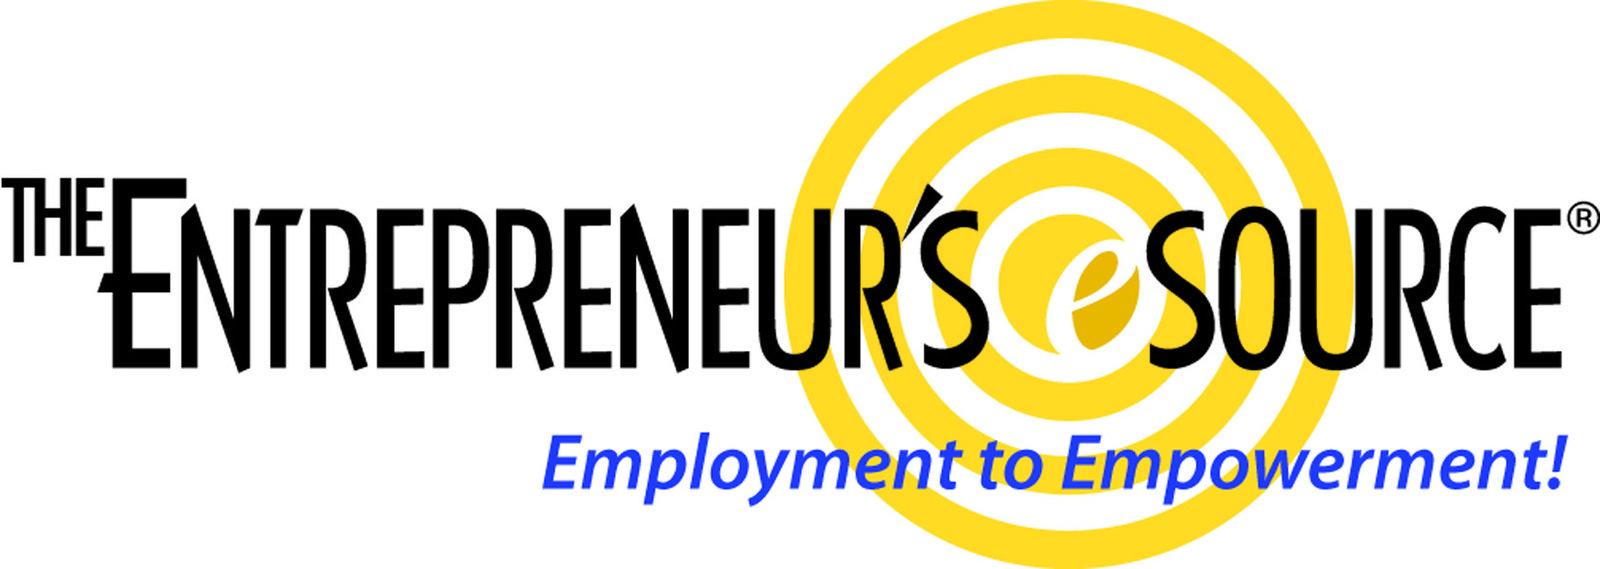 The Entrepreneurs' Source